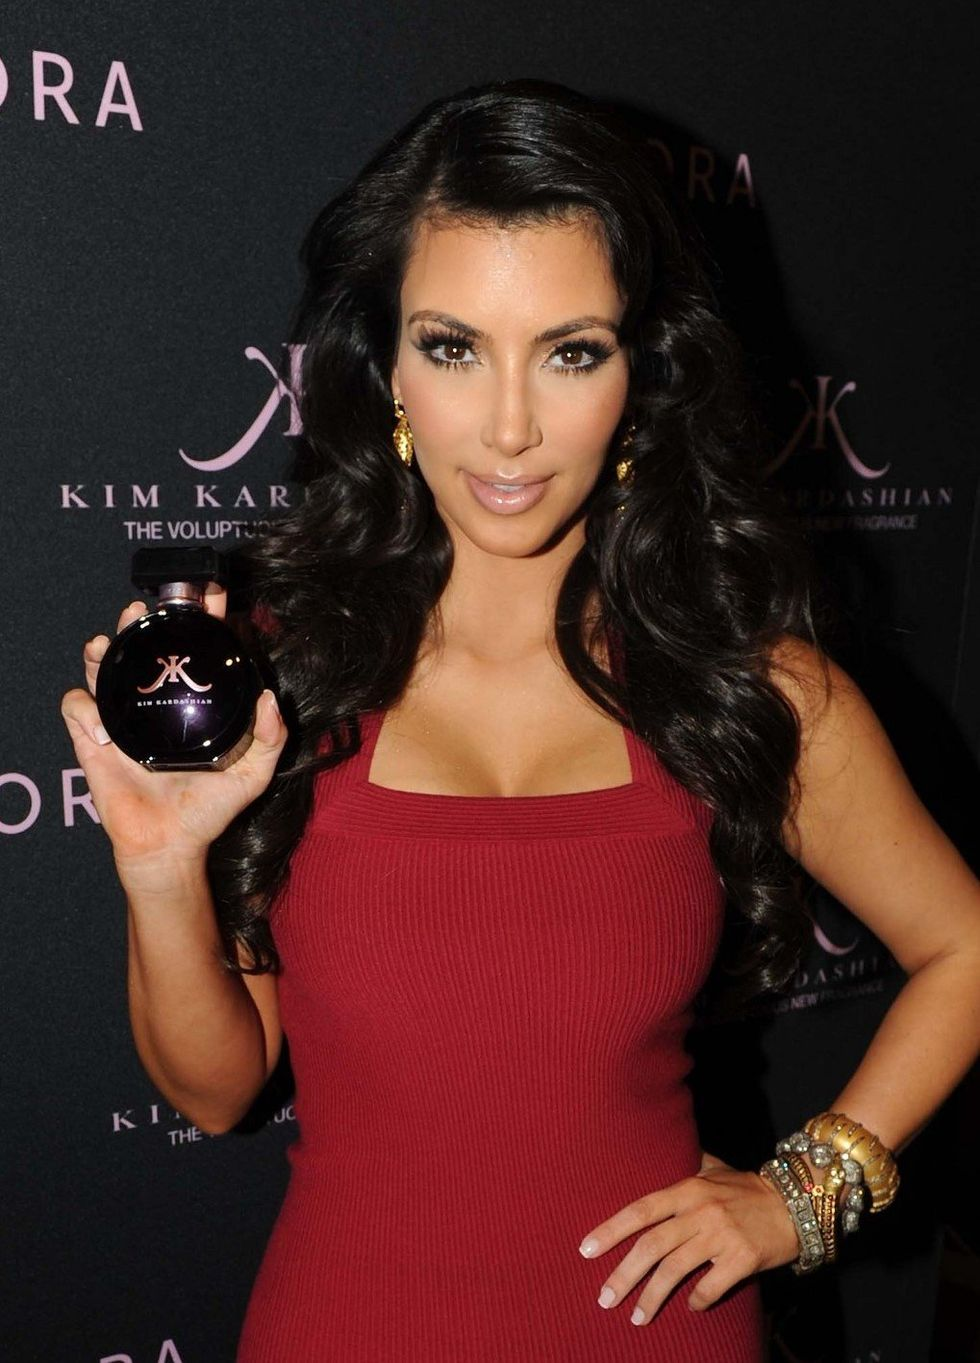 kim-kardashian-kim-kardashian-fragrance-launch-at-sephora-in-miami-01